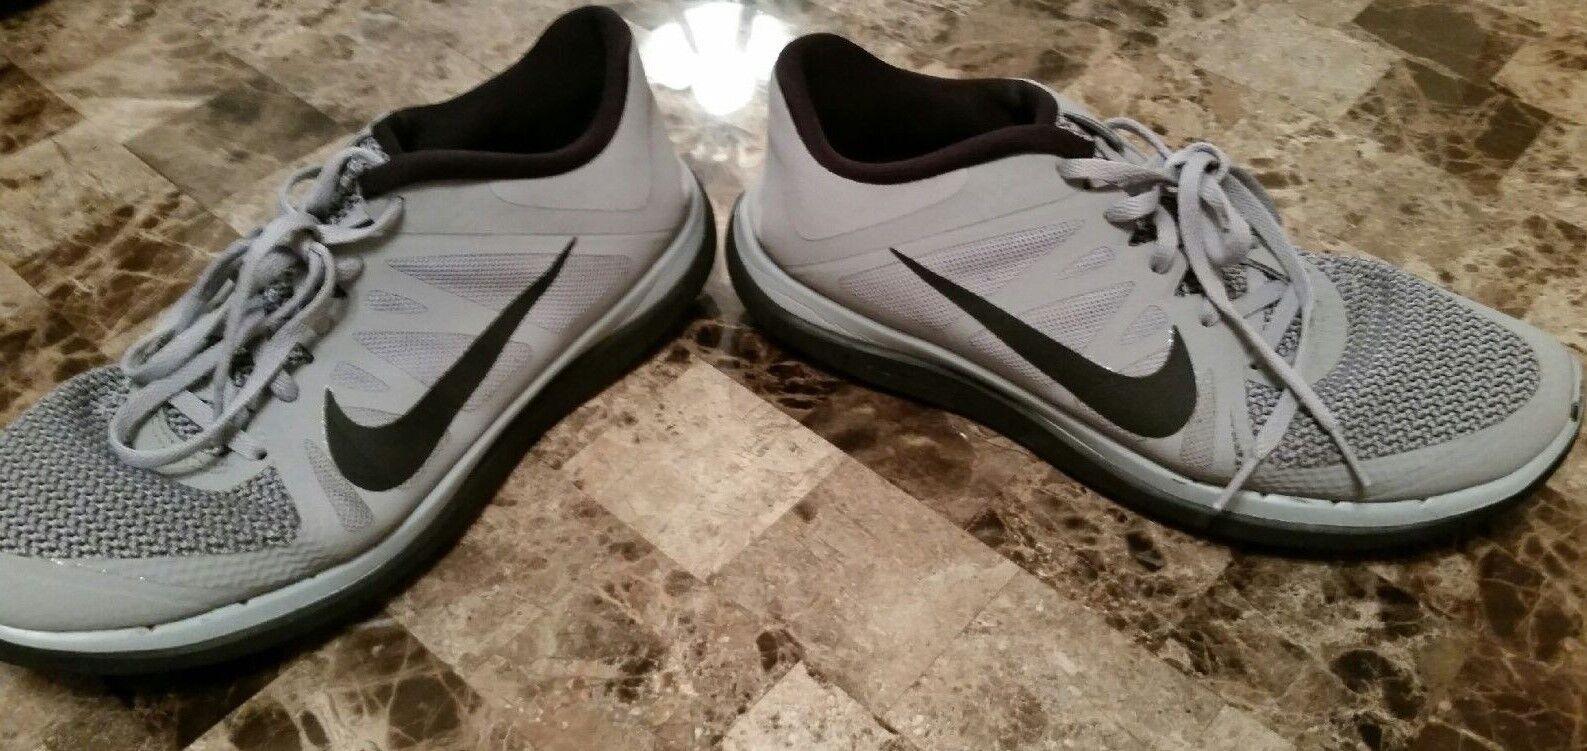 Running da Nike Grigio Free uomo 0 V4 Sneakers 4 sCQrdht